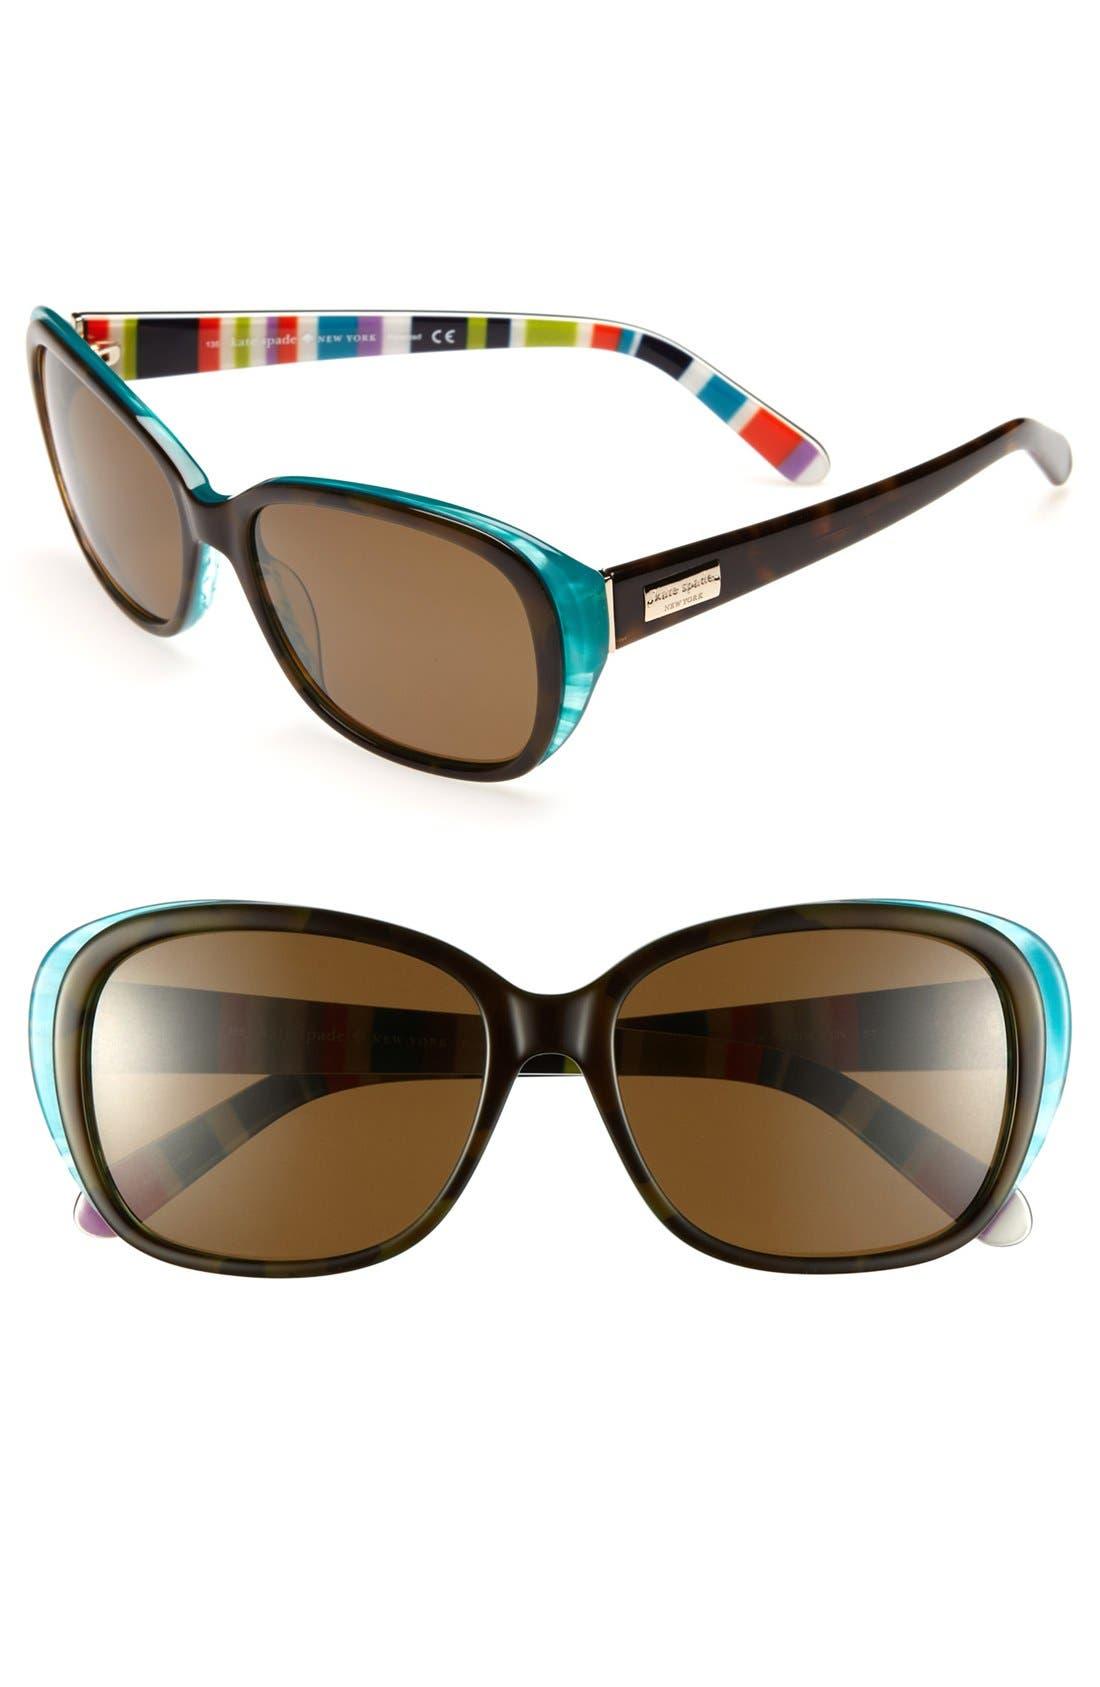 Main Image - kate spade new york 'hilde' 54mm polarized sunglasses